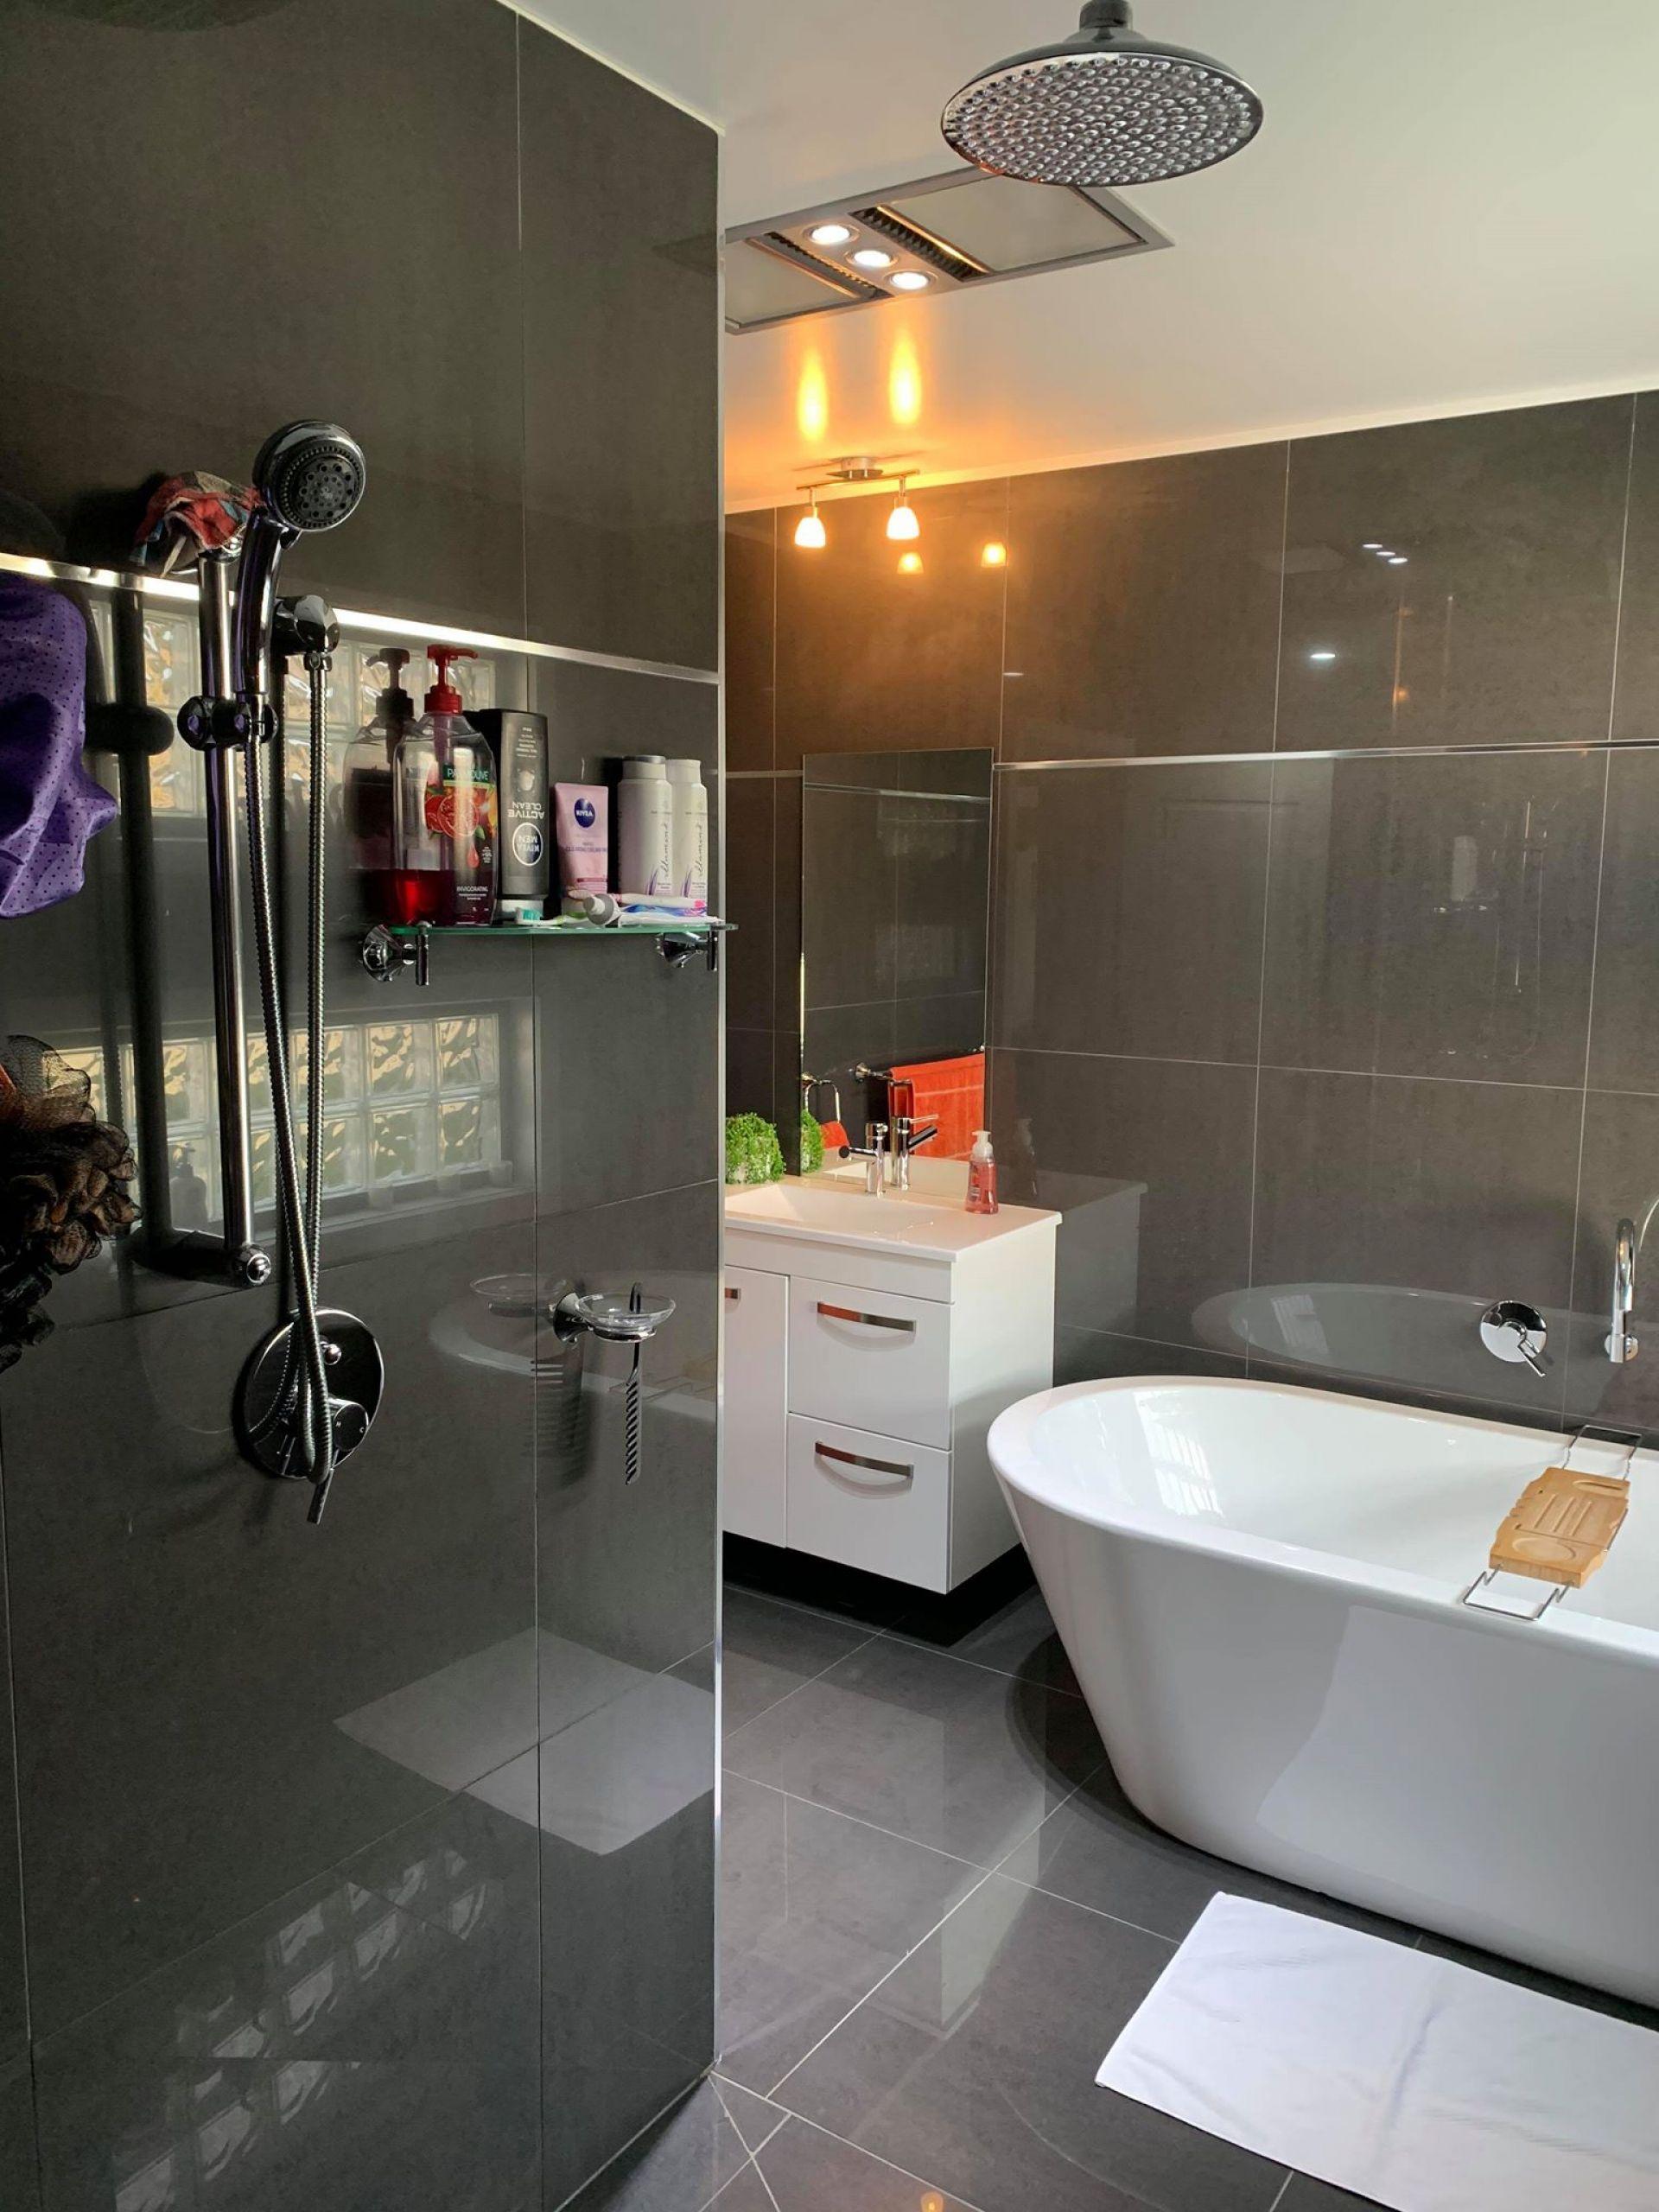 Sold House 28 Platinum Drive Burnie Tas 7320 Aug 8 2020 Homely